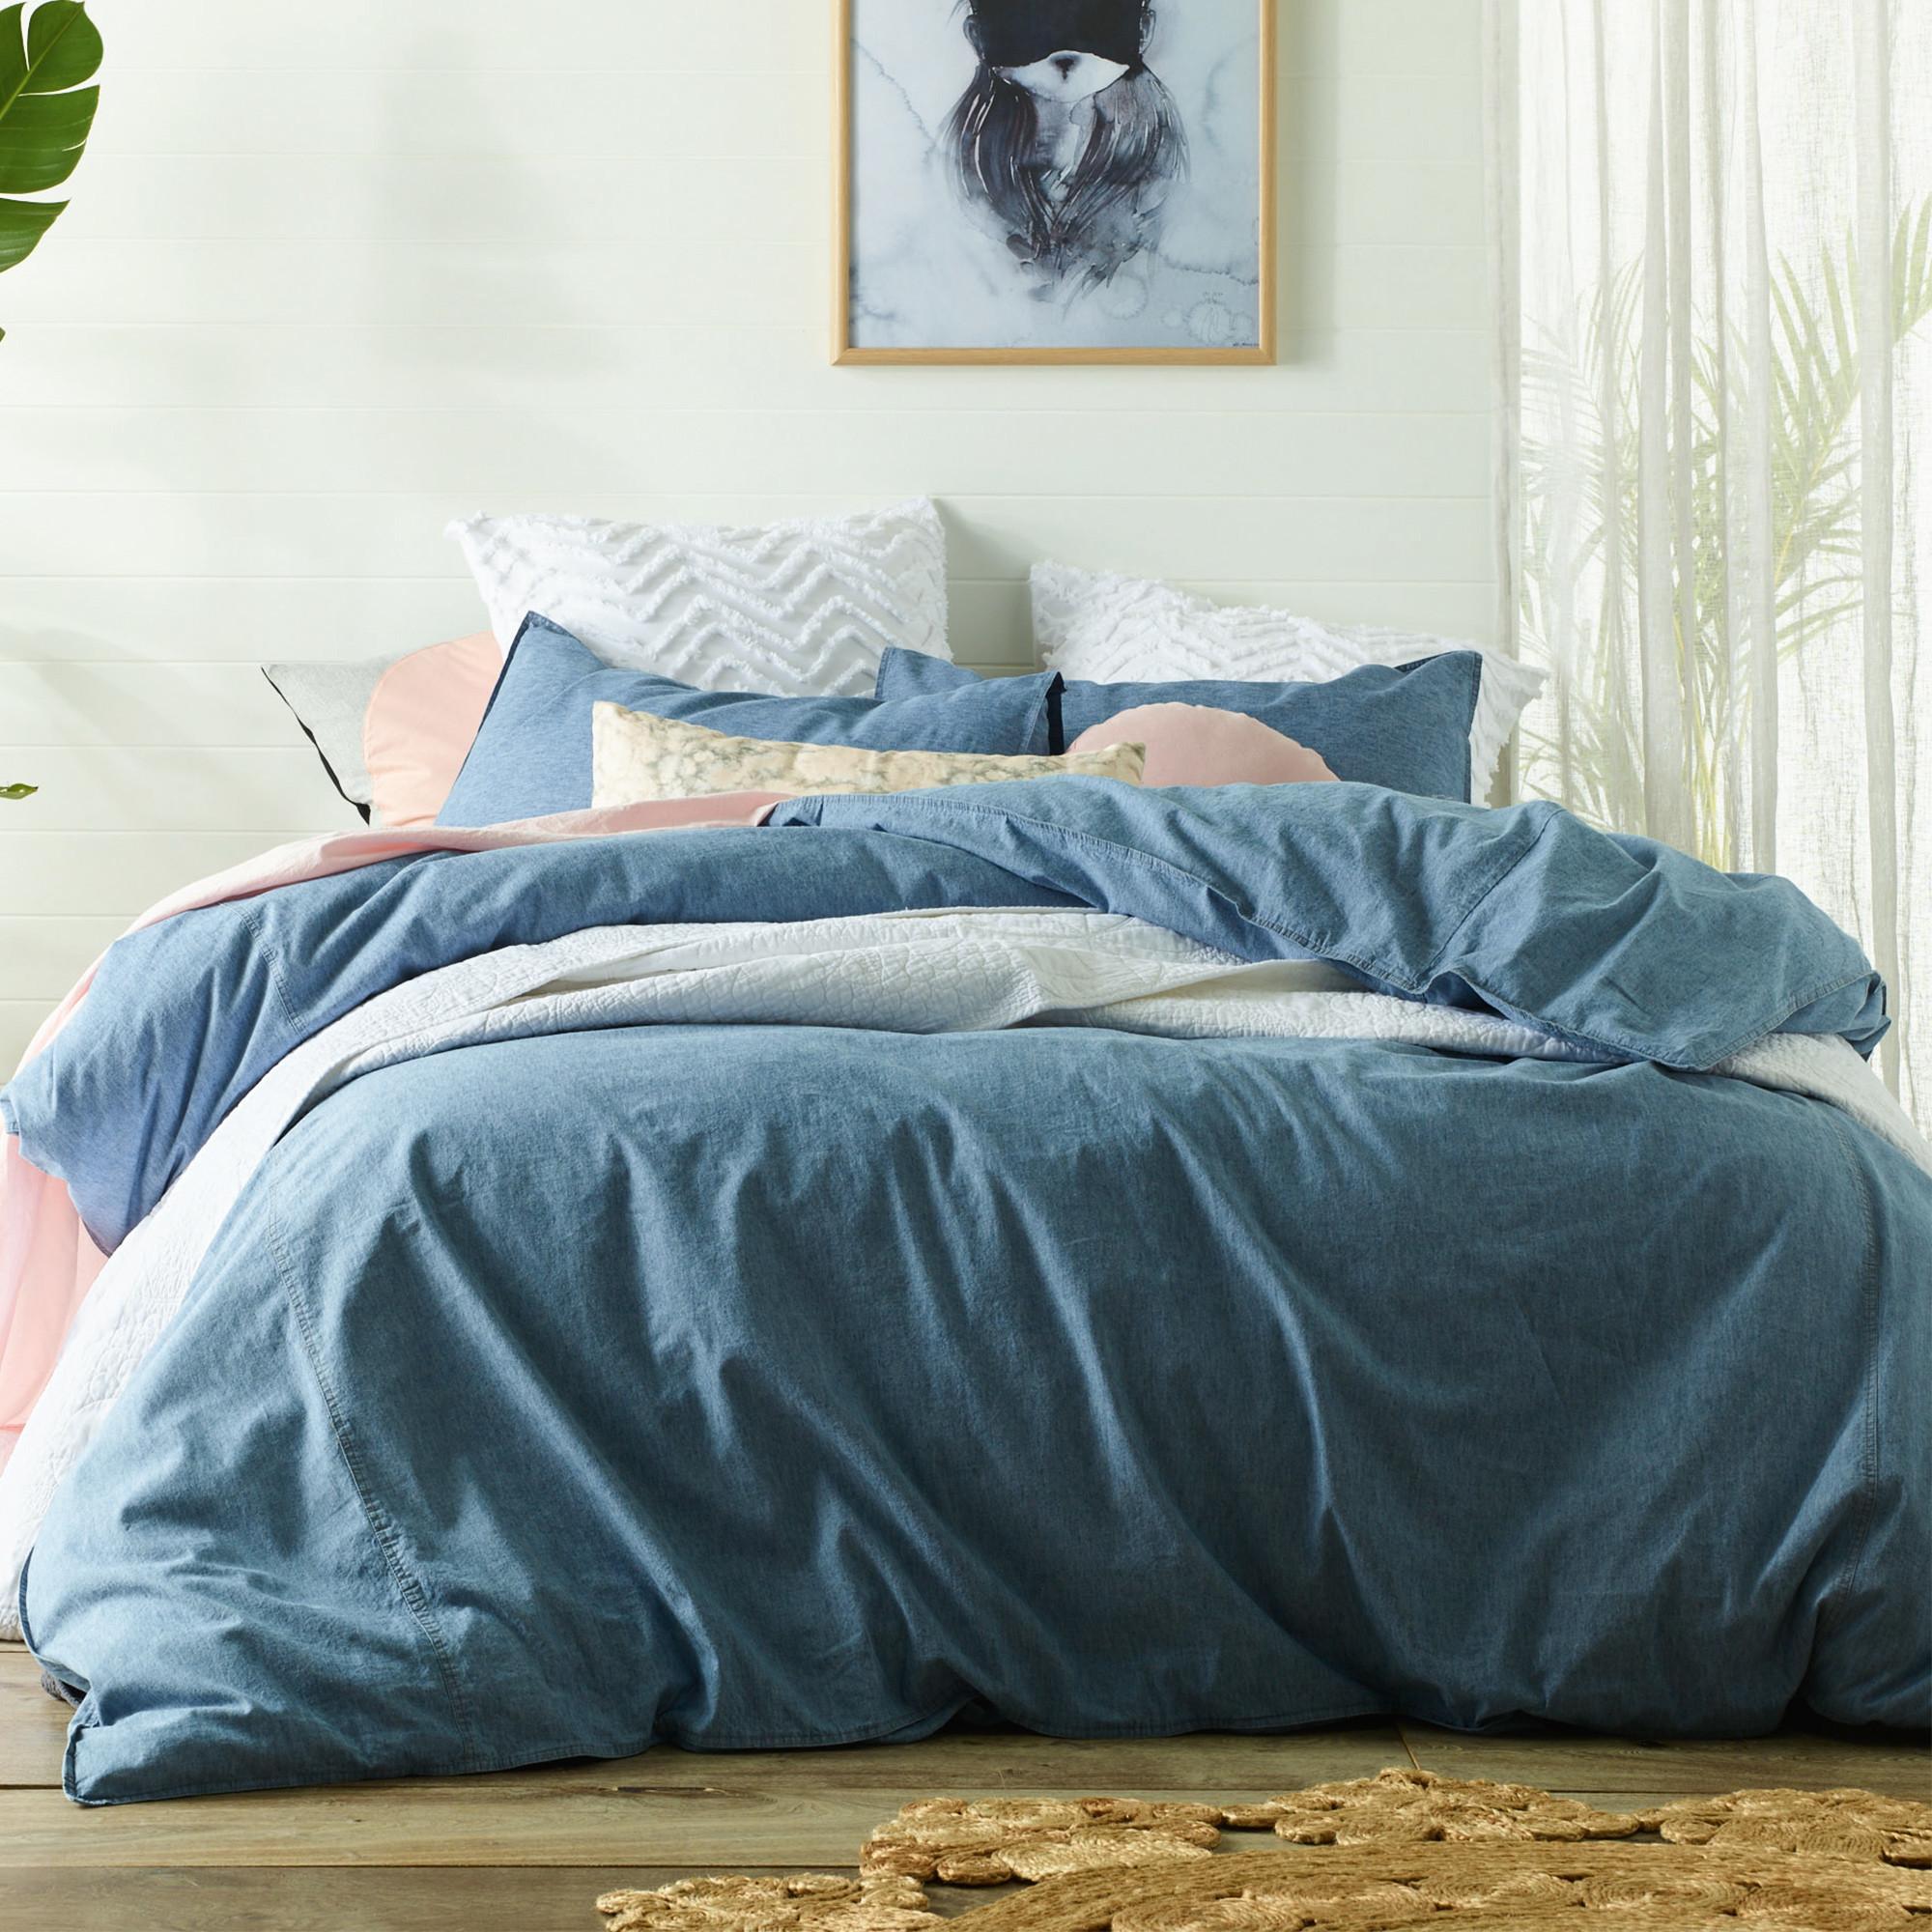 New Stonewashed Denim Linen Amp Cotton Quilt Cover Set Ebay